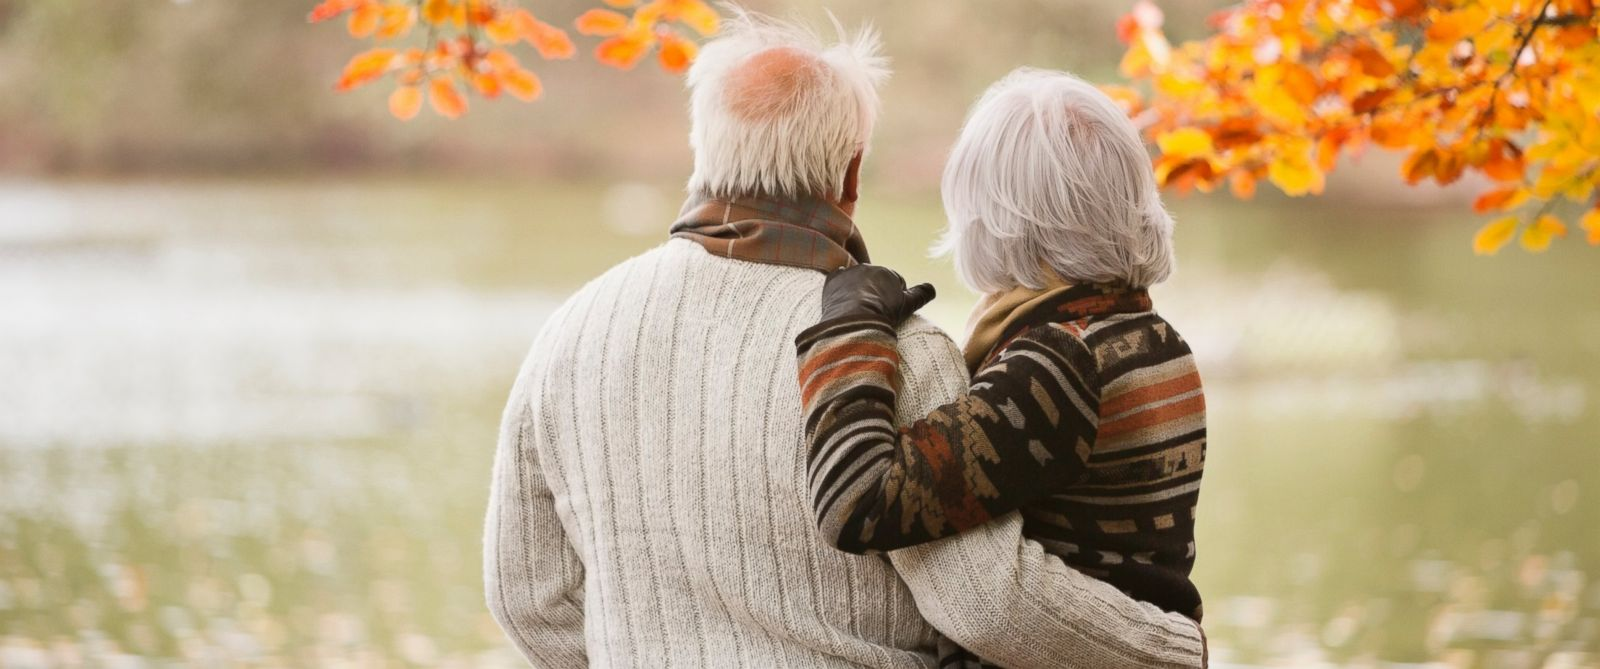 gty_older_couple_medicare_lb_141202_12x5_1600